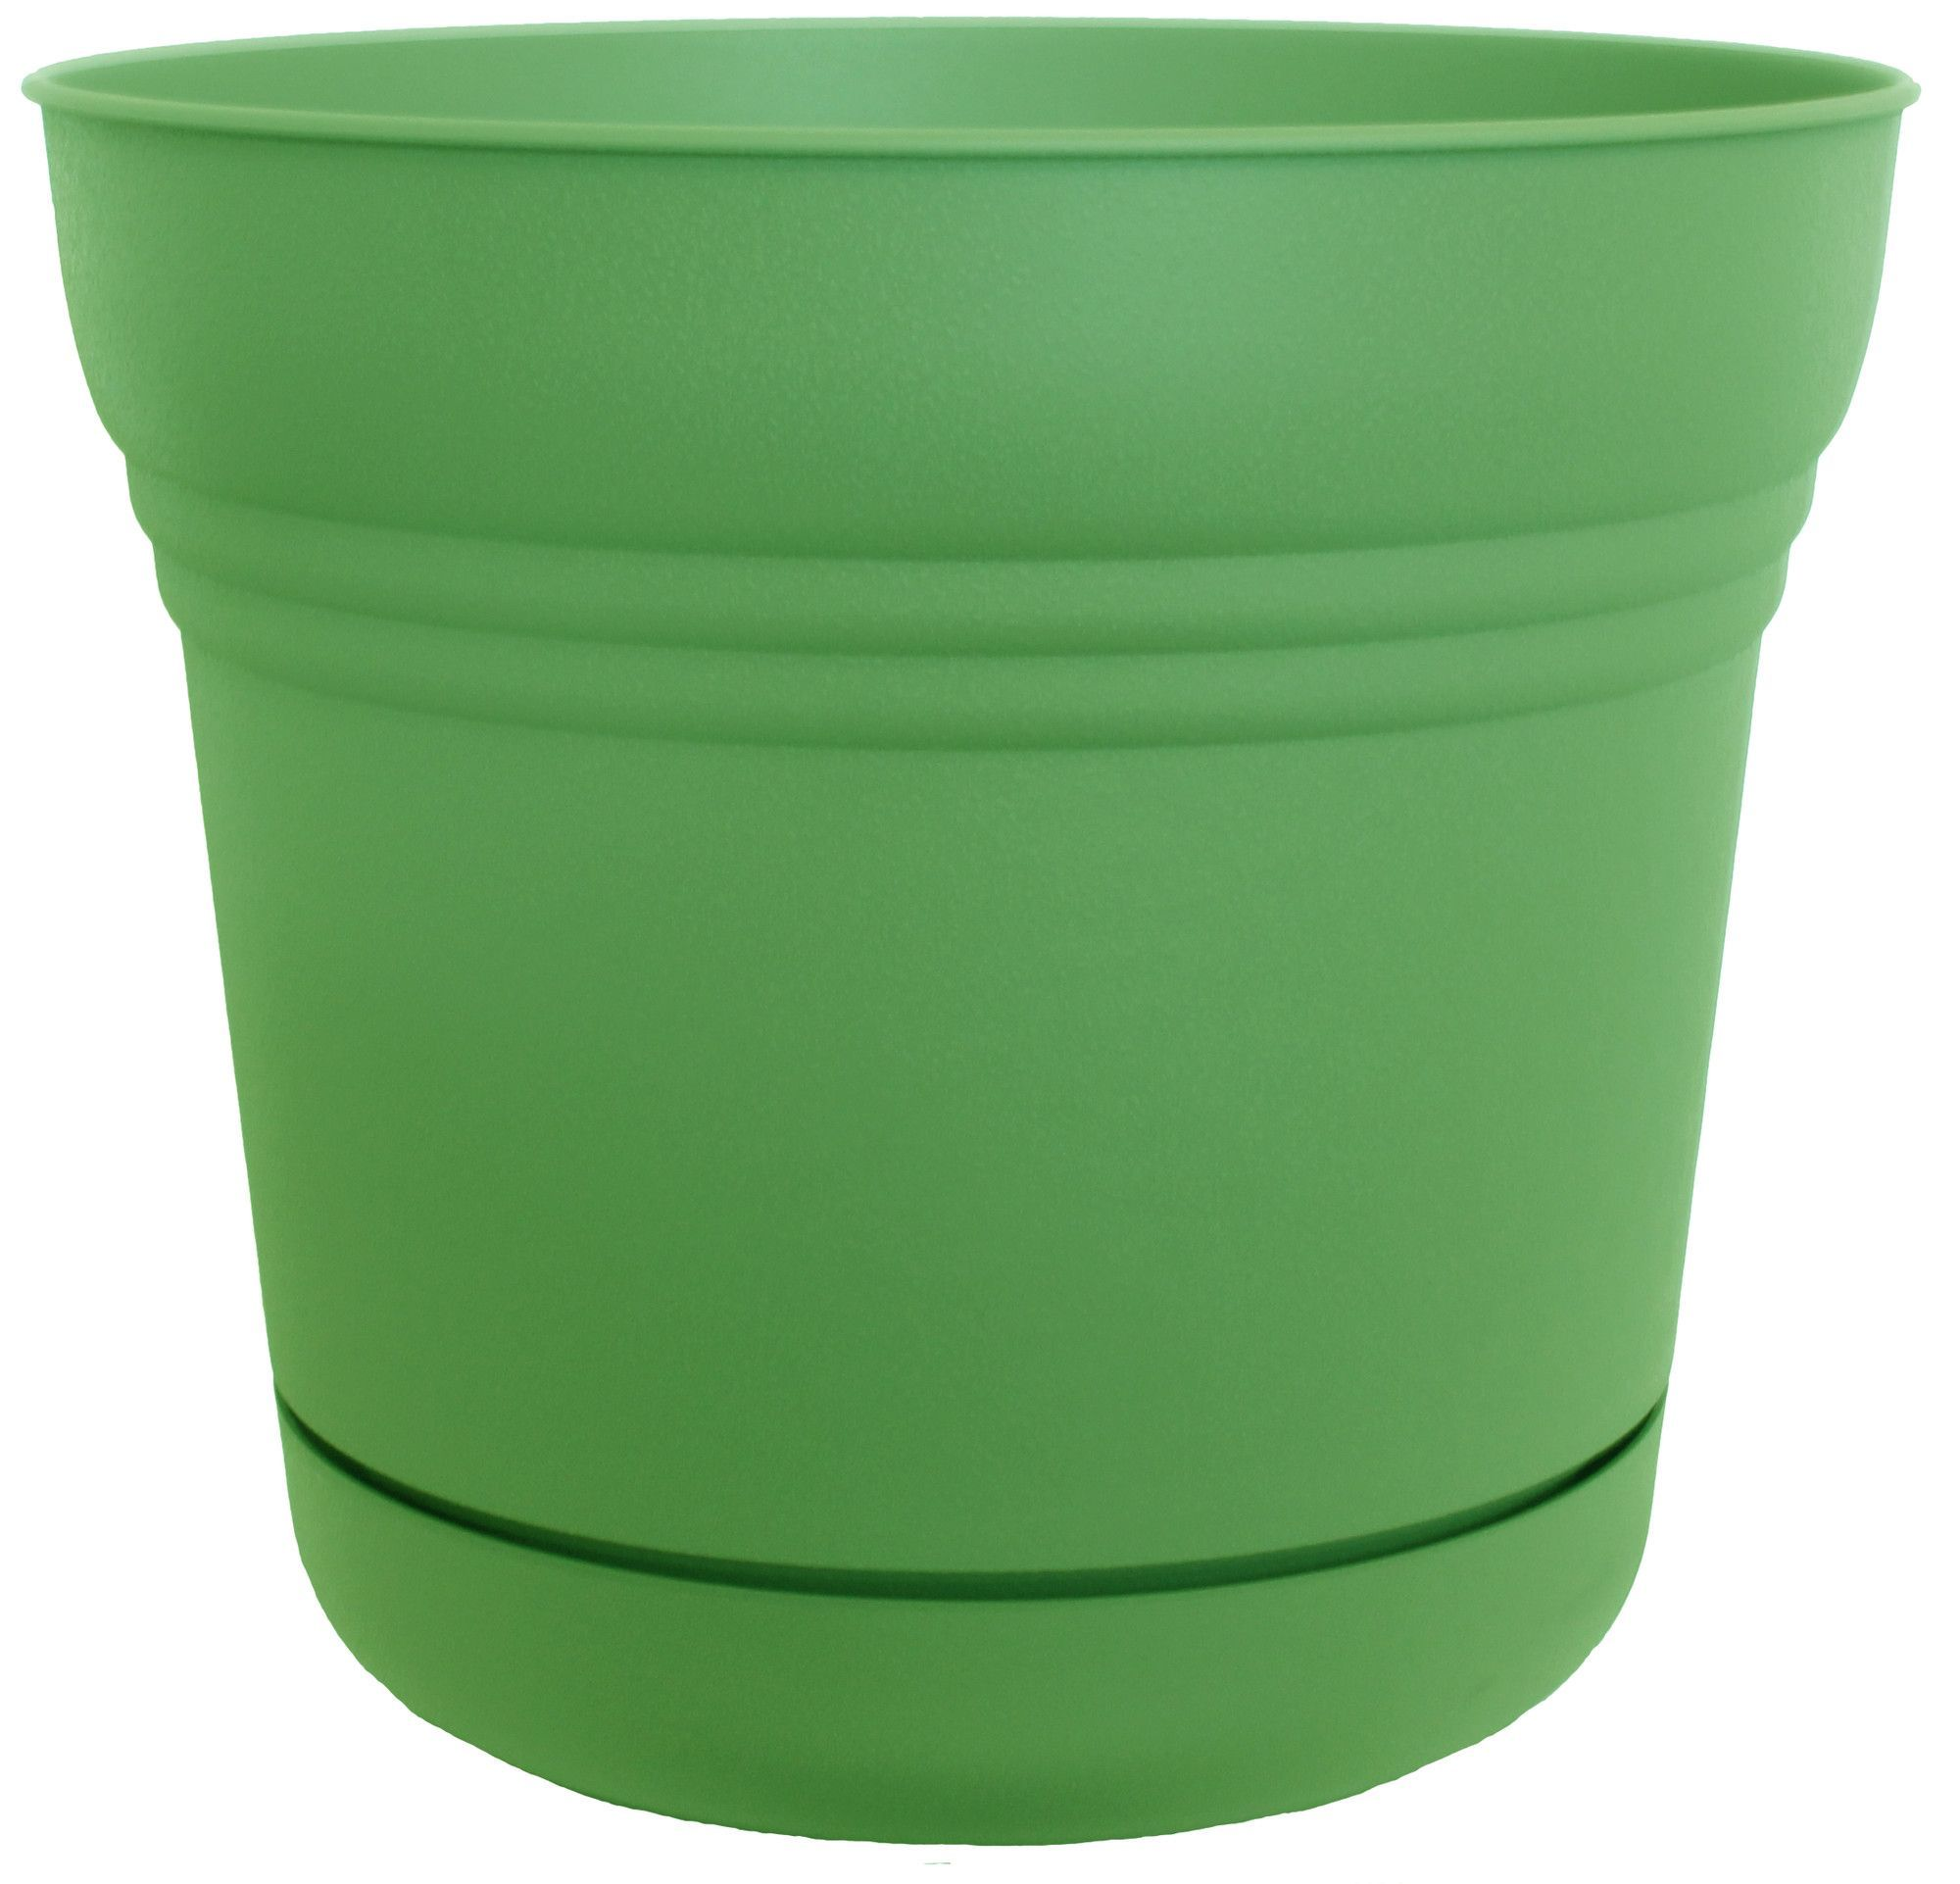 Saturn Plastic Pot Planter Products